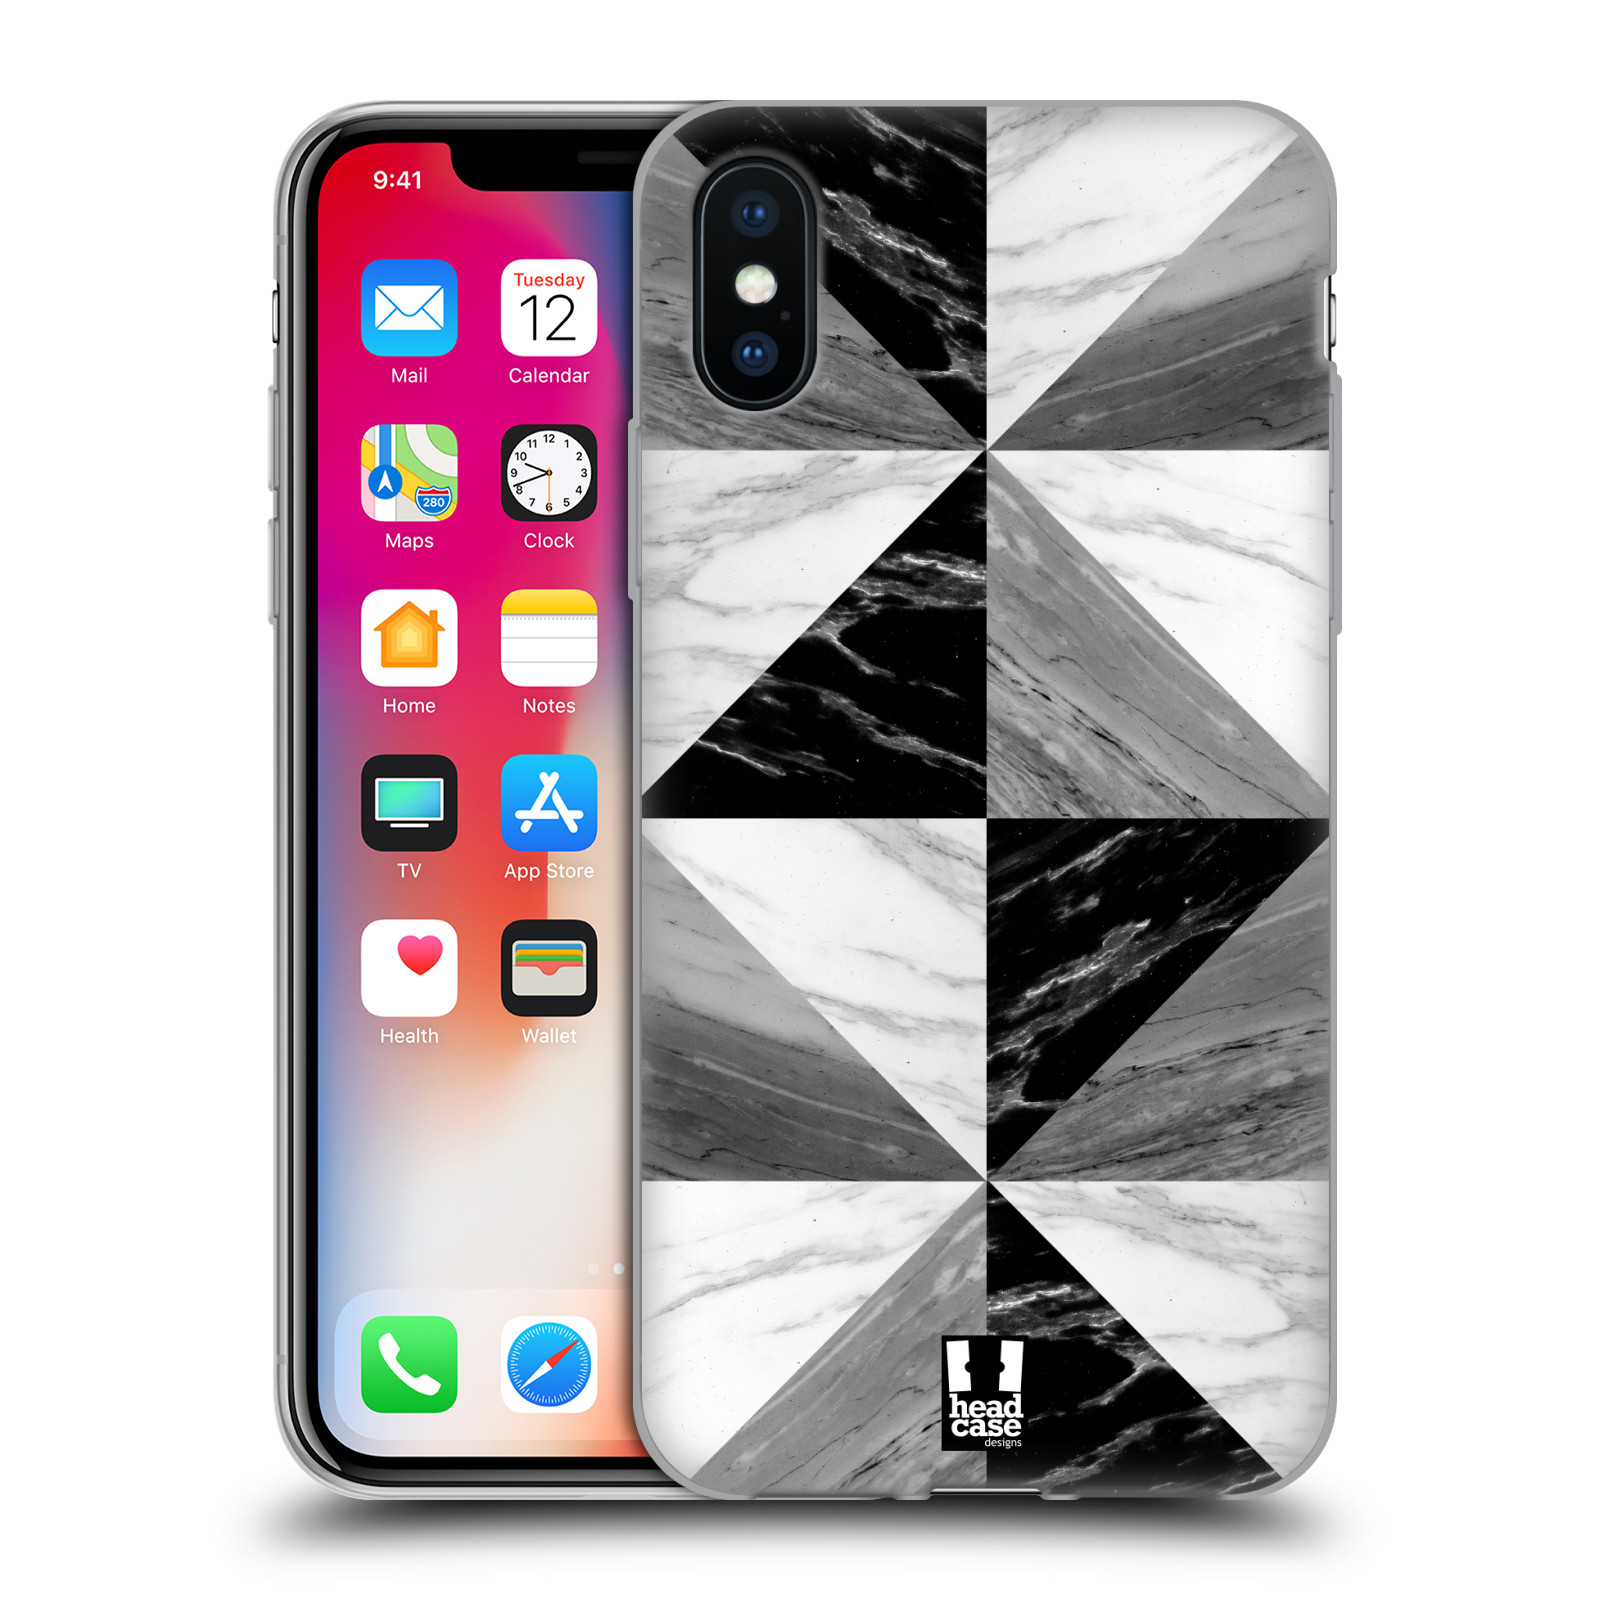 Silikonové pouzdro na mobil Apple iPhone XS - Head Case - Mramor triangl